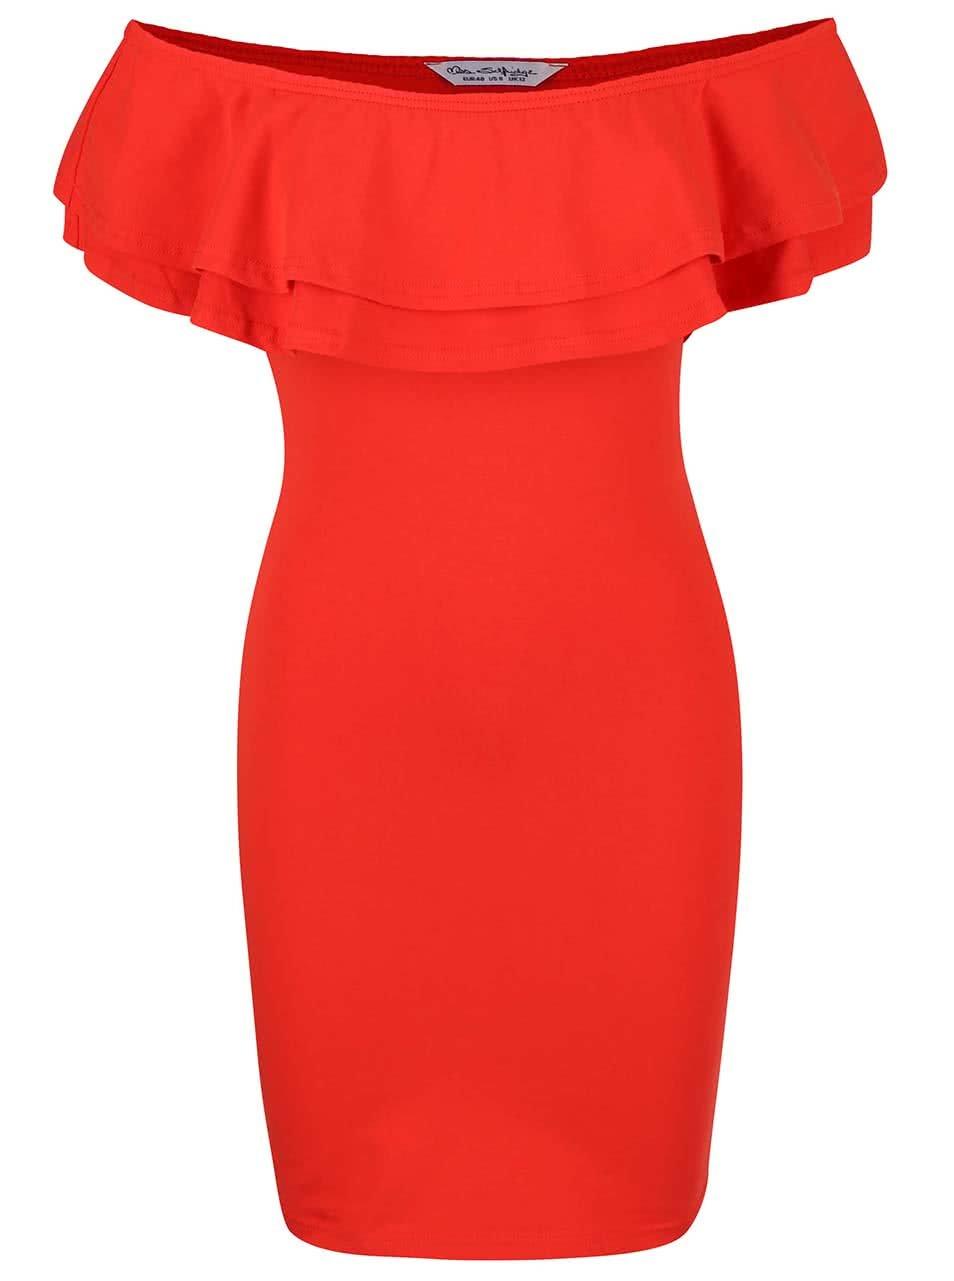 84639fa0b05b Červené šaty s volánikmi Miss Selfridge ...